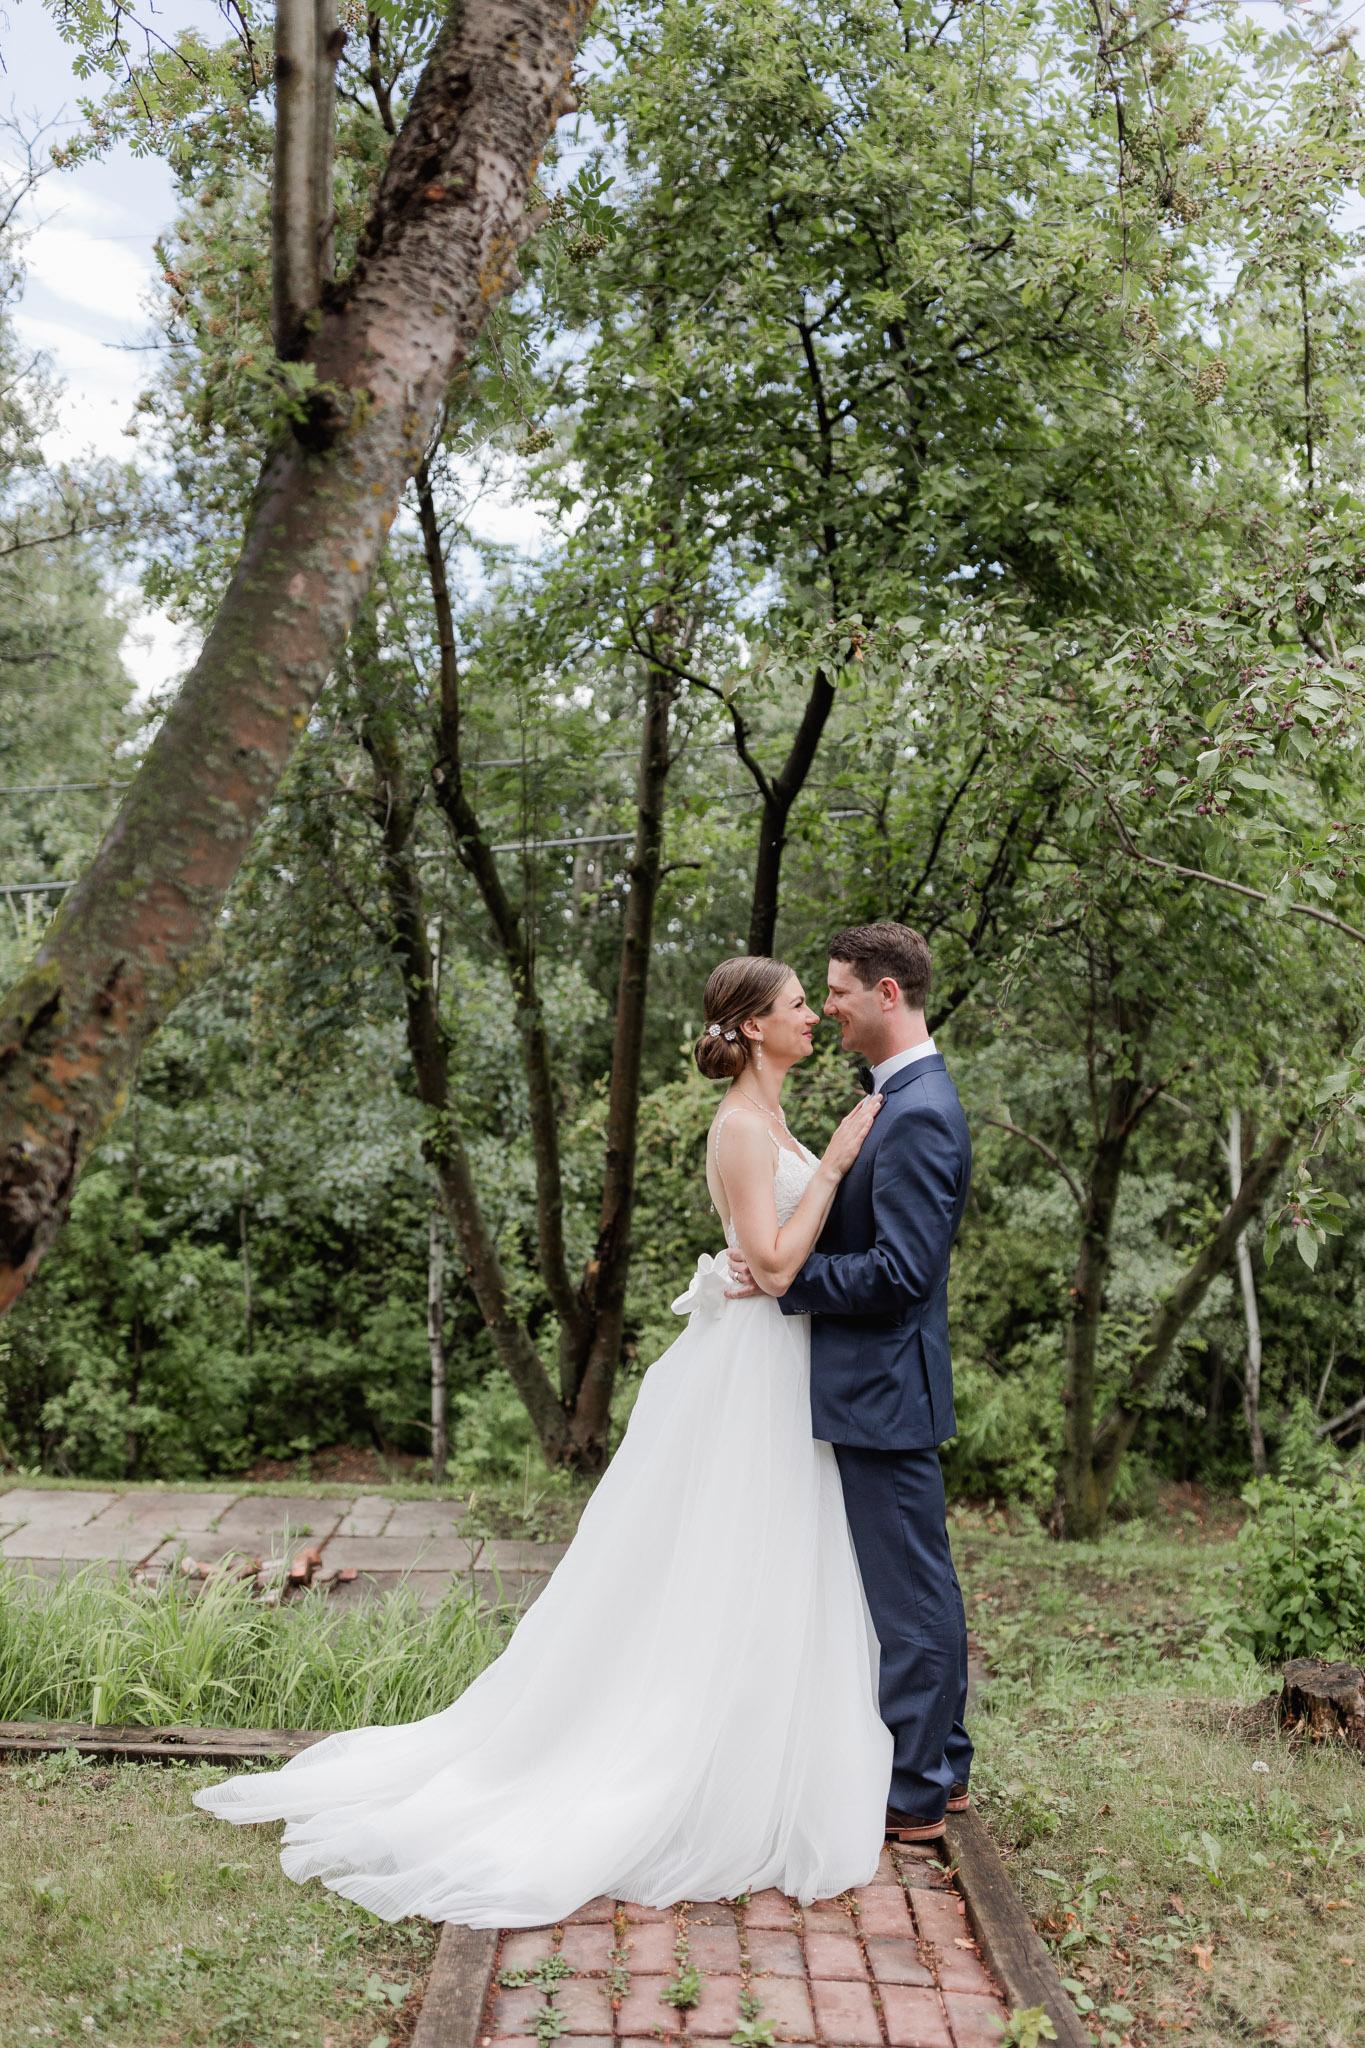 Intimate wedding photographers